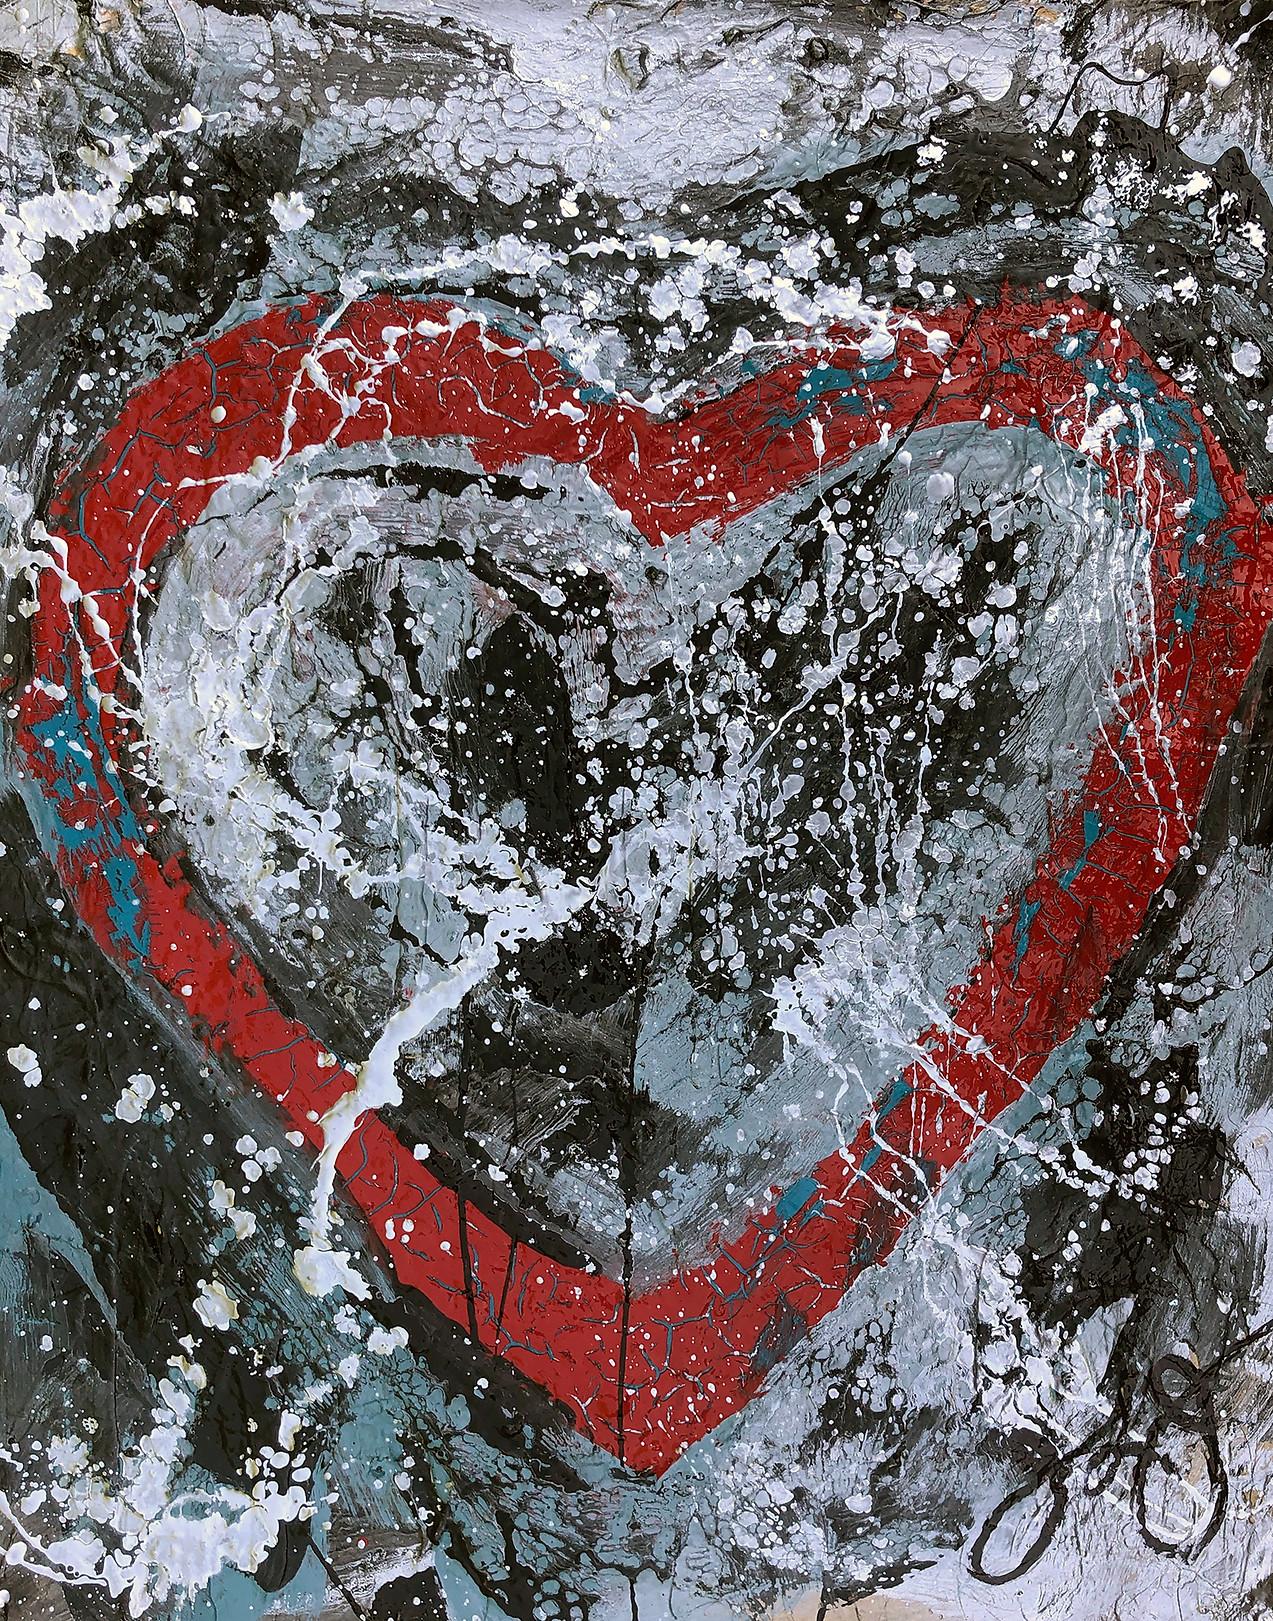 essen's heart 28.jpg